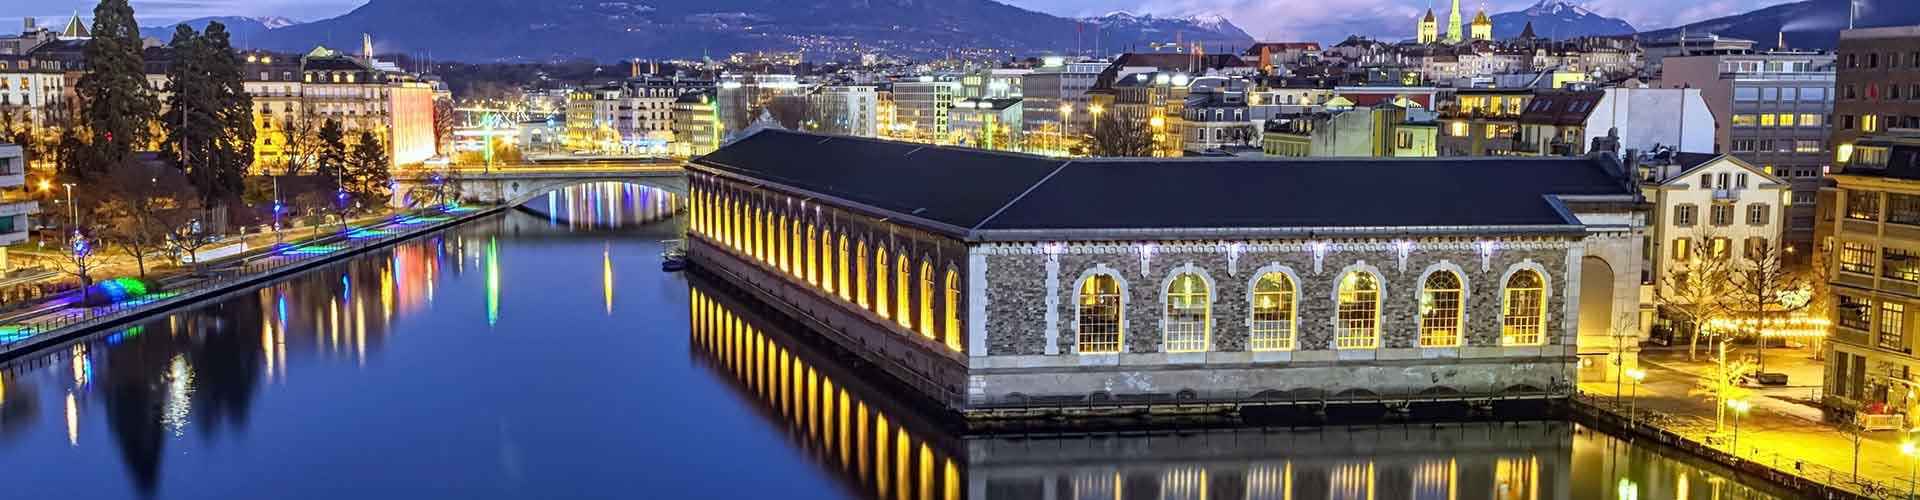 Ginebra - Hoteles baratos en el distrito Grottes - Saint-Gervais. Mapas de Ginebra, Fotos y comentarios de cada Hotel barato en Ginebra.